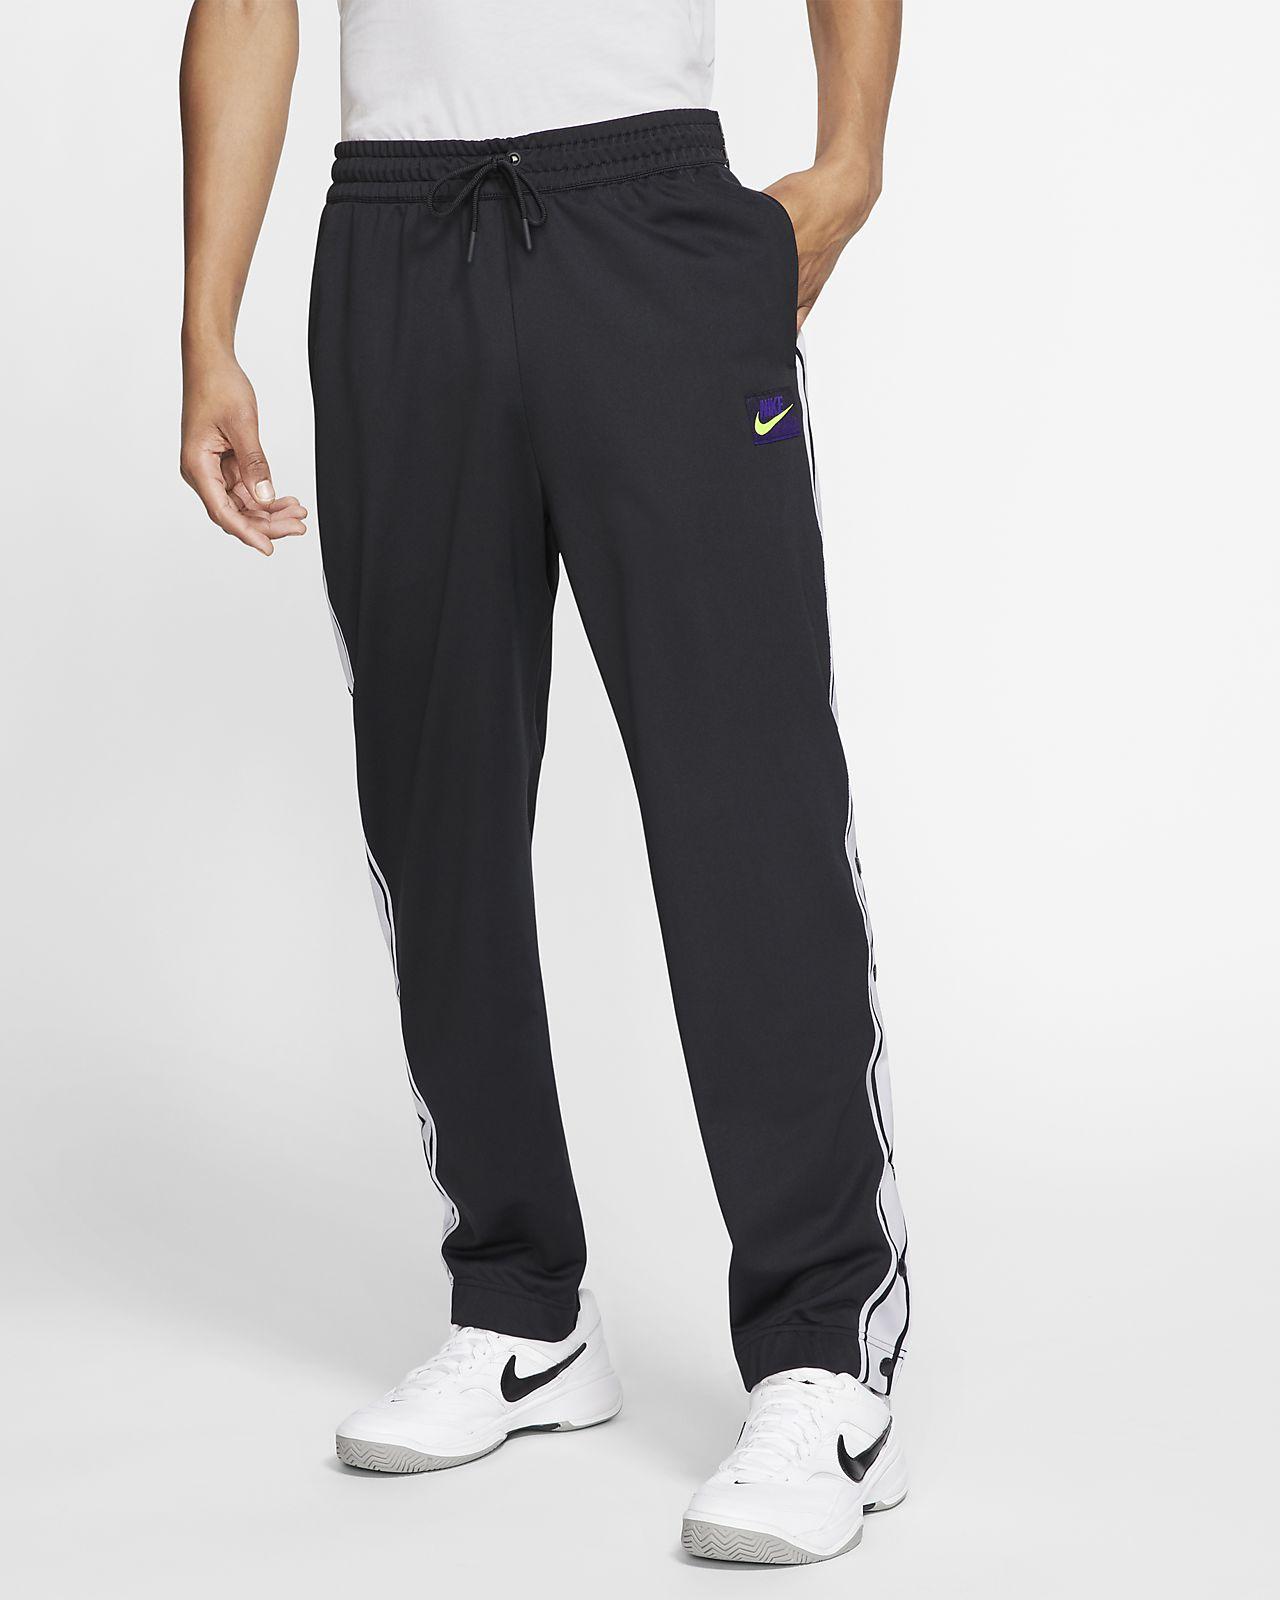 NikeCourt Slam Men's Tennis Pants